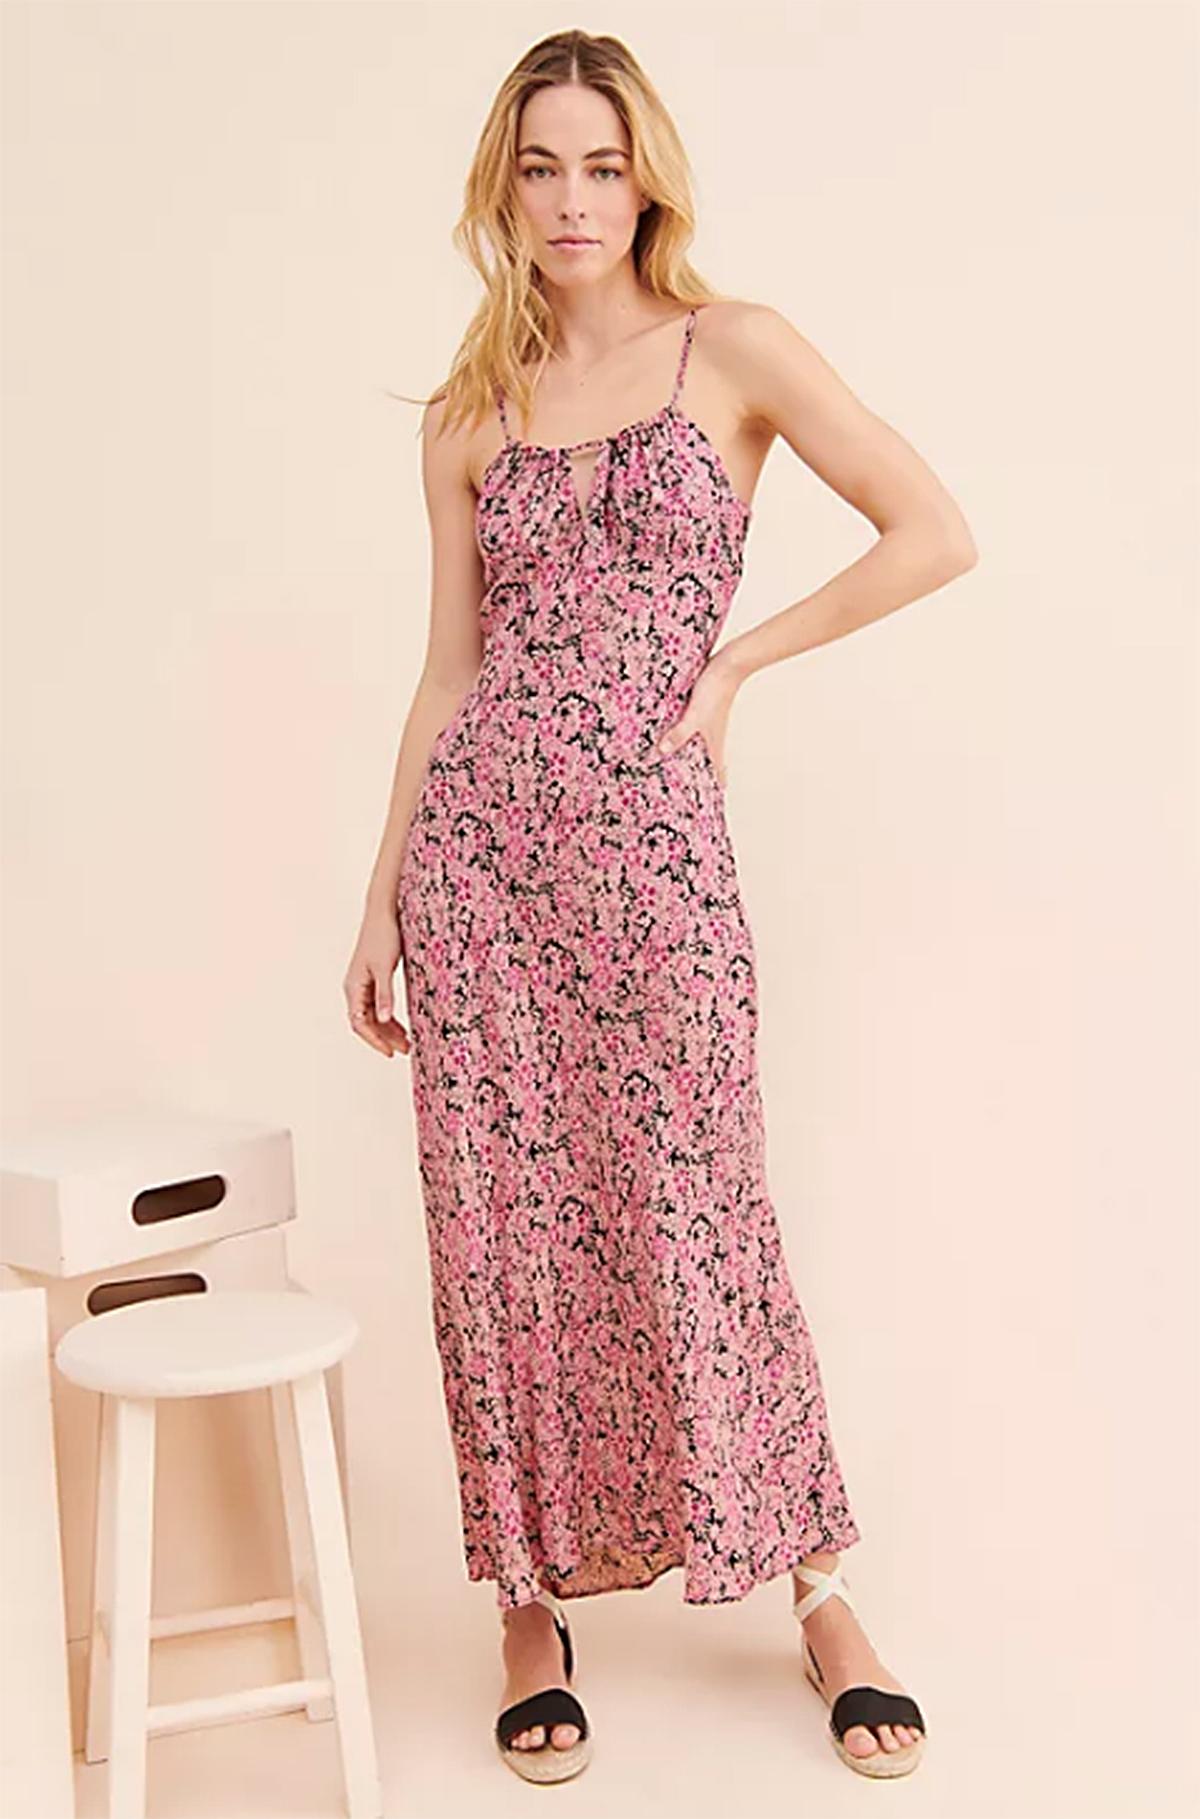 free-people-dress-sale-pink-floral